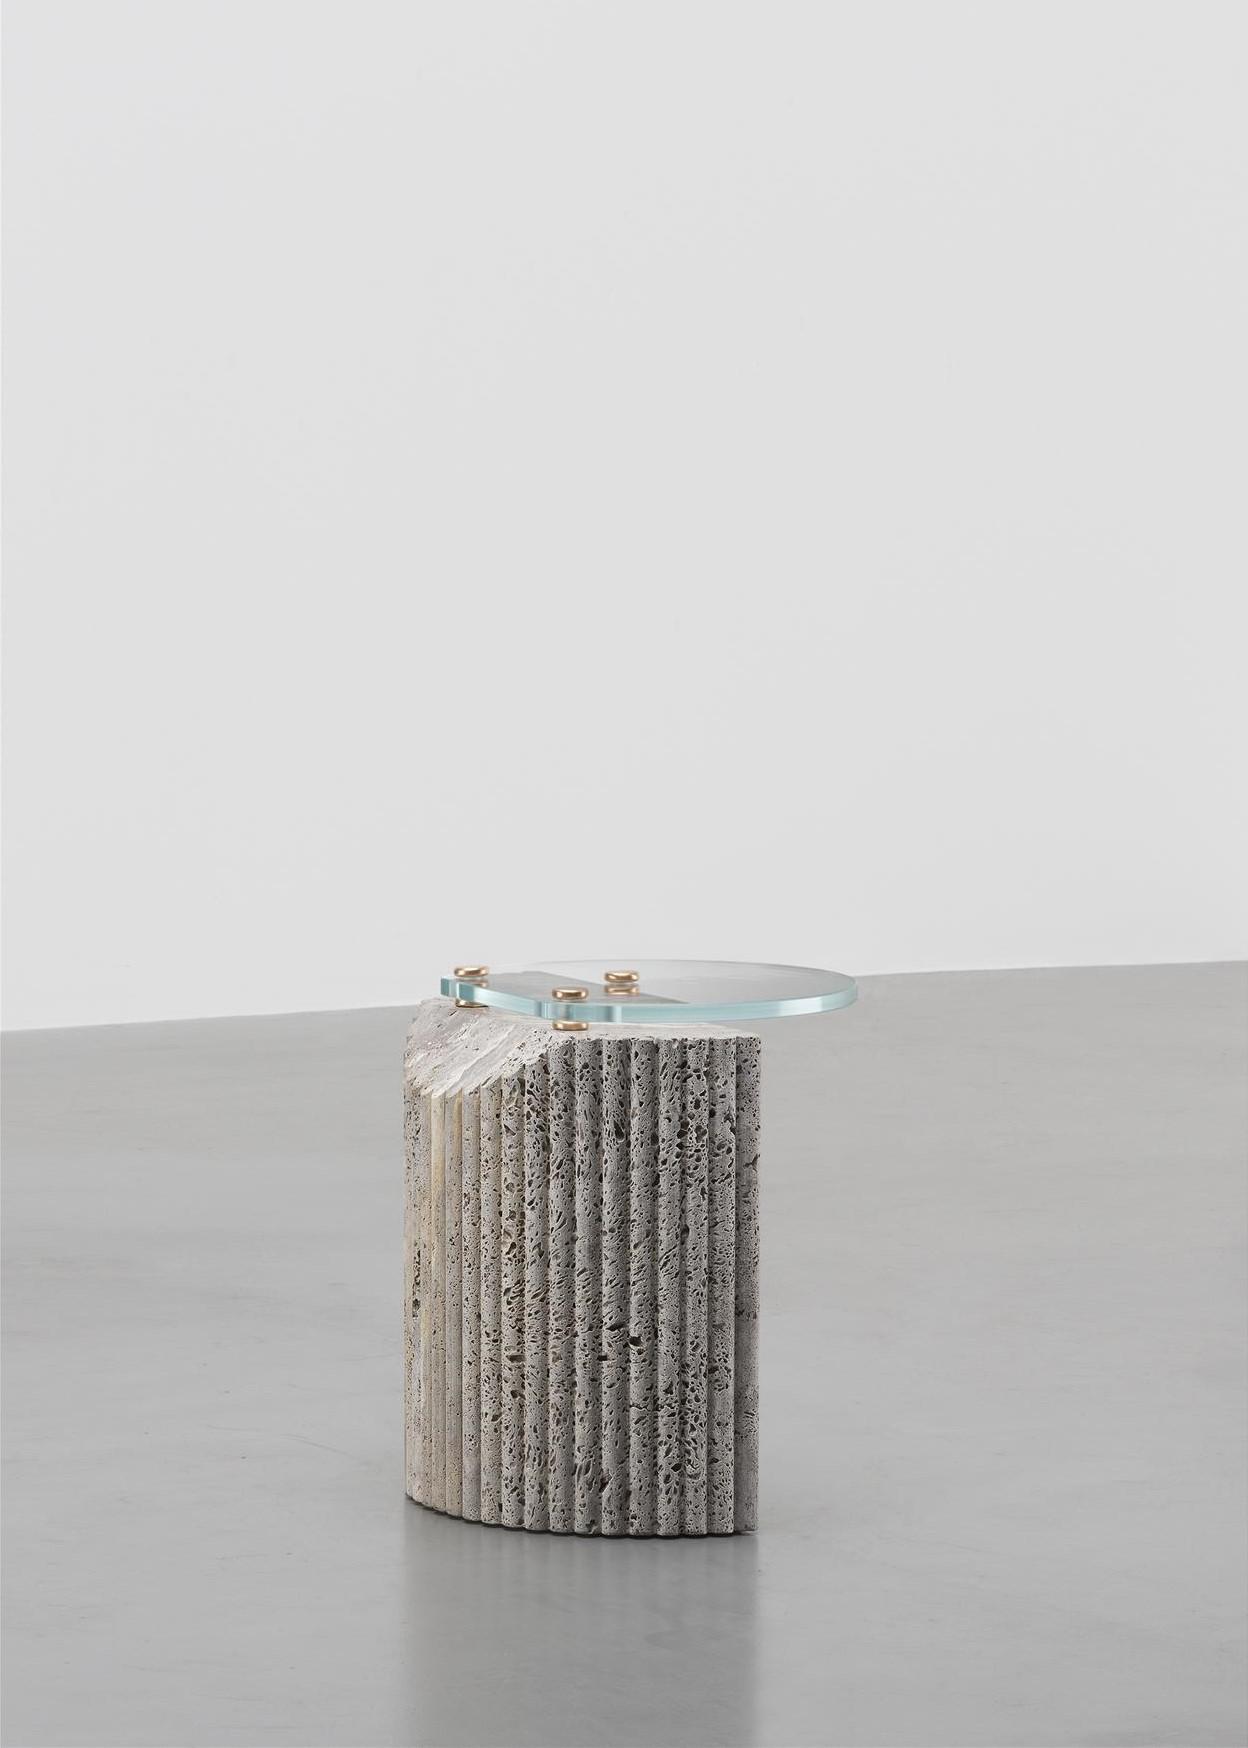 Minimalist Collection Supernova by david/nicolas